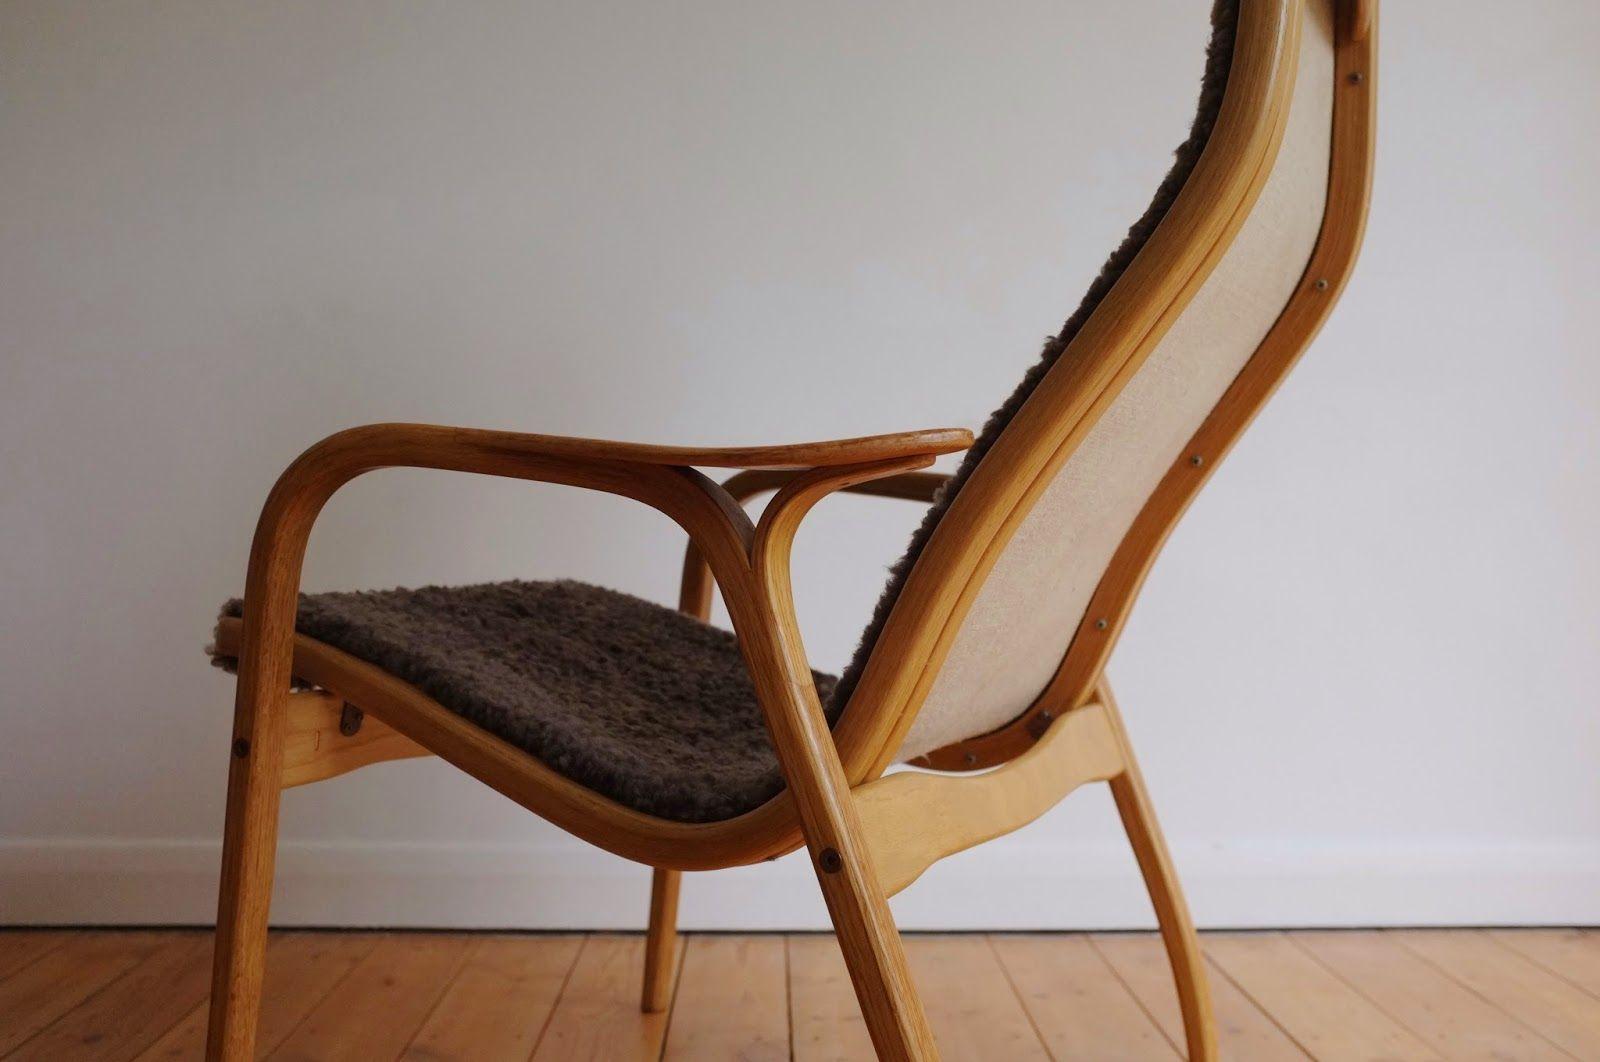 Laminou chair designed by Yngve Ekstrom for Swedese Mobler Sweden